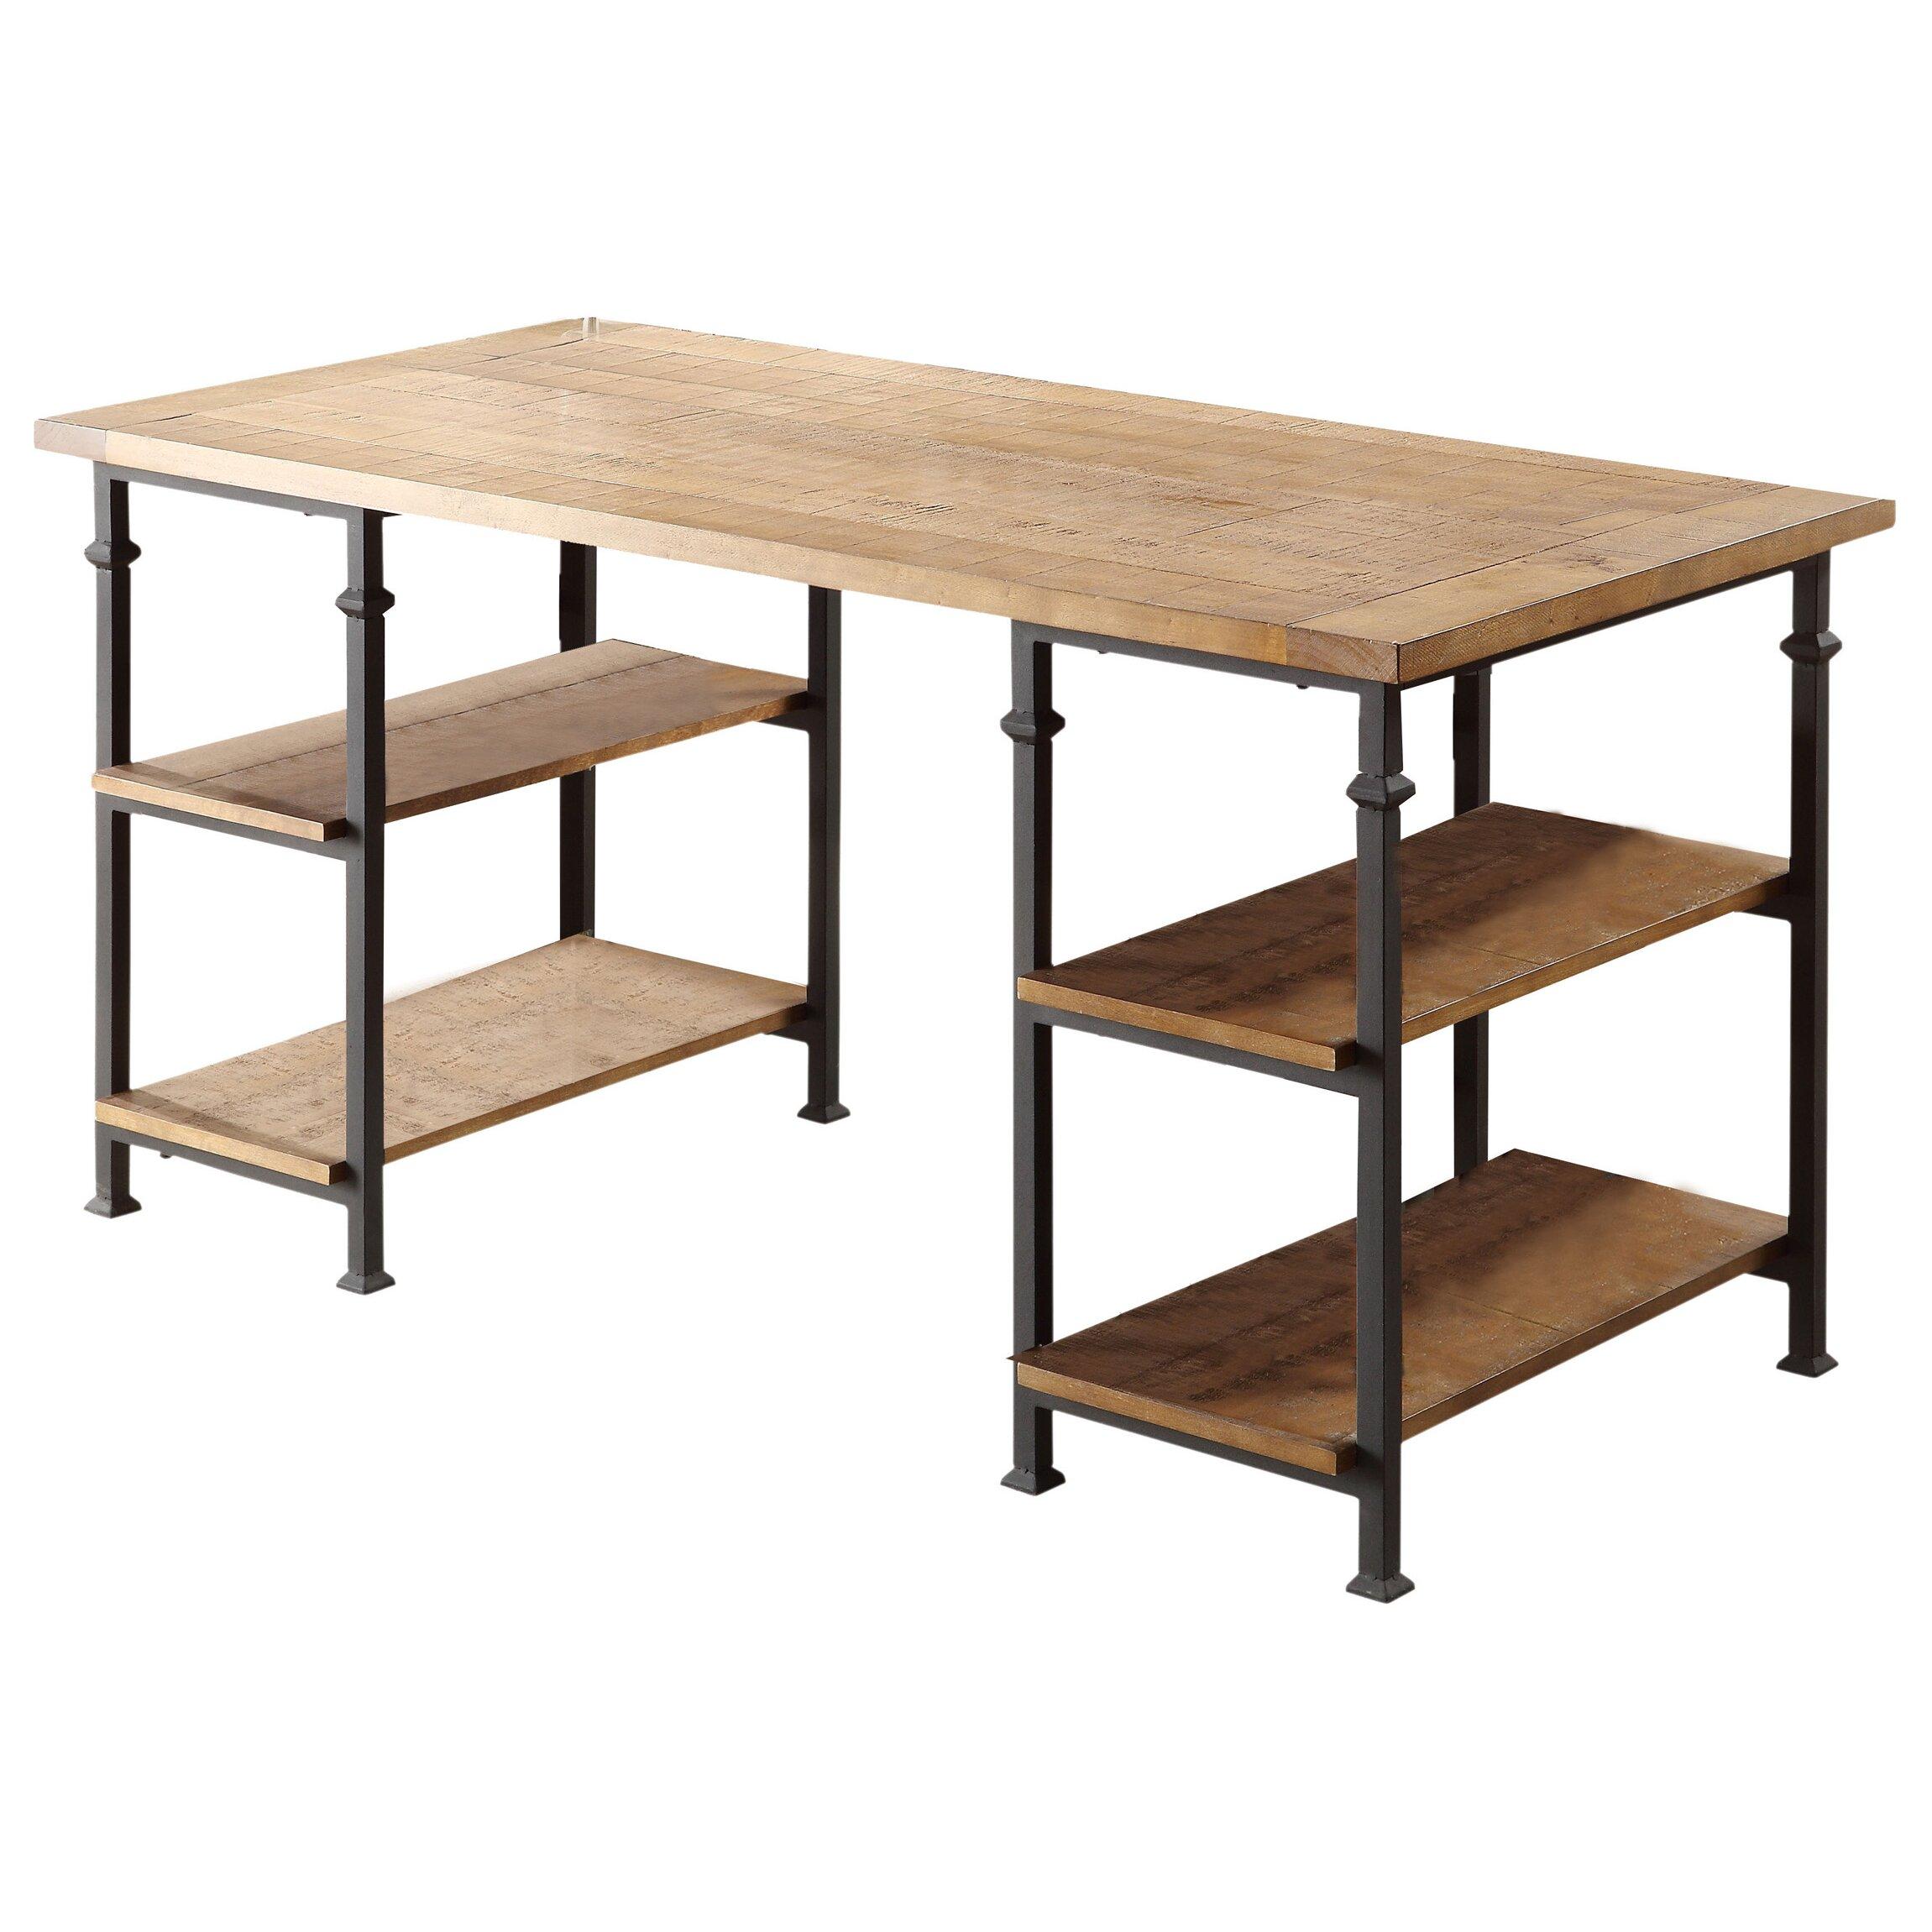 August grove oliver writing desk reviews wayfair - Industrial office desk ...